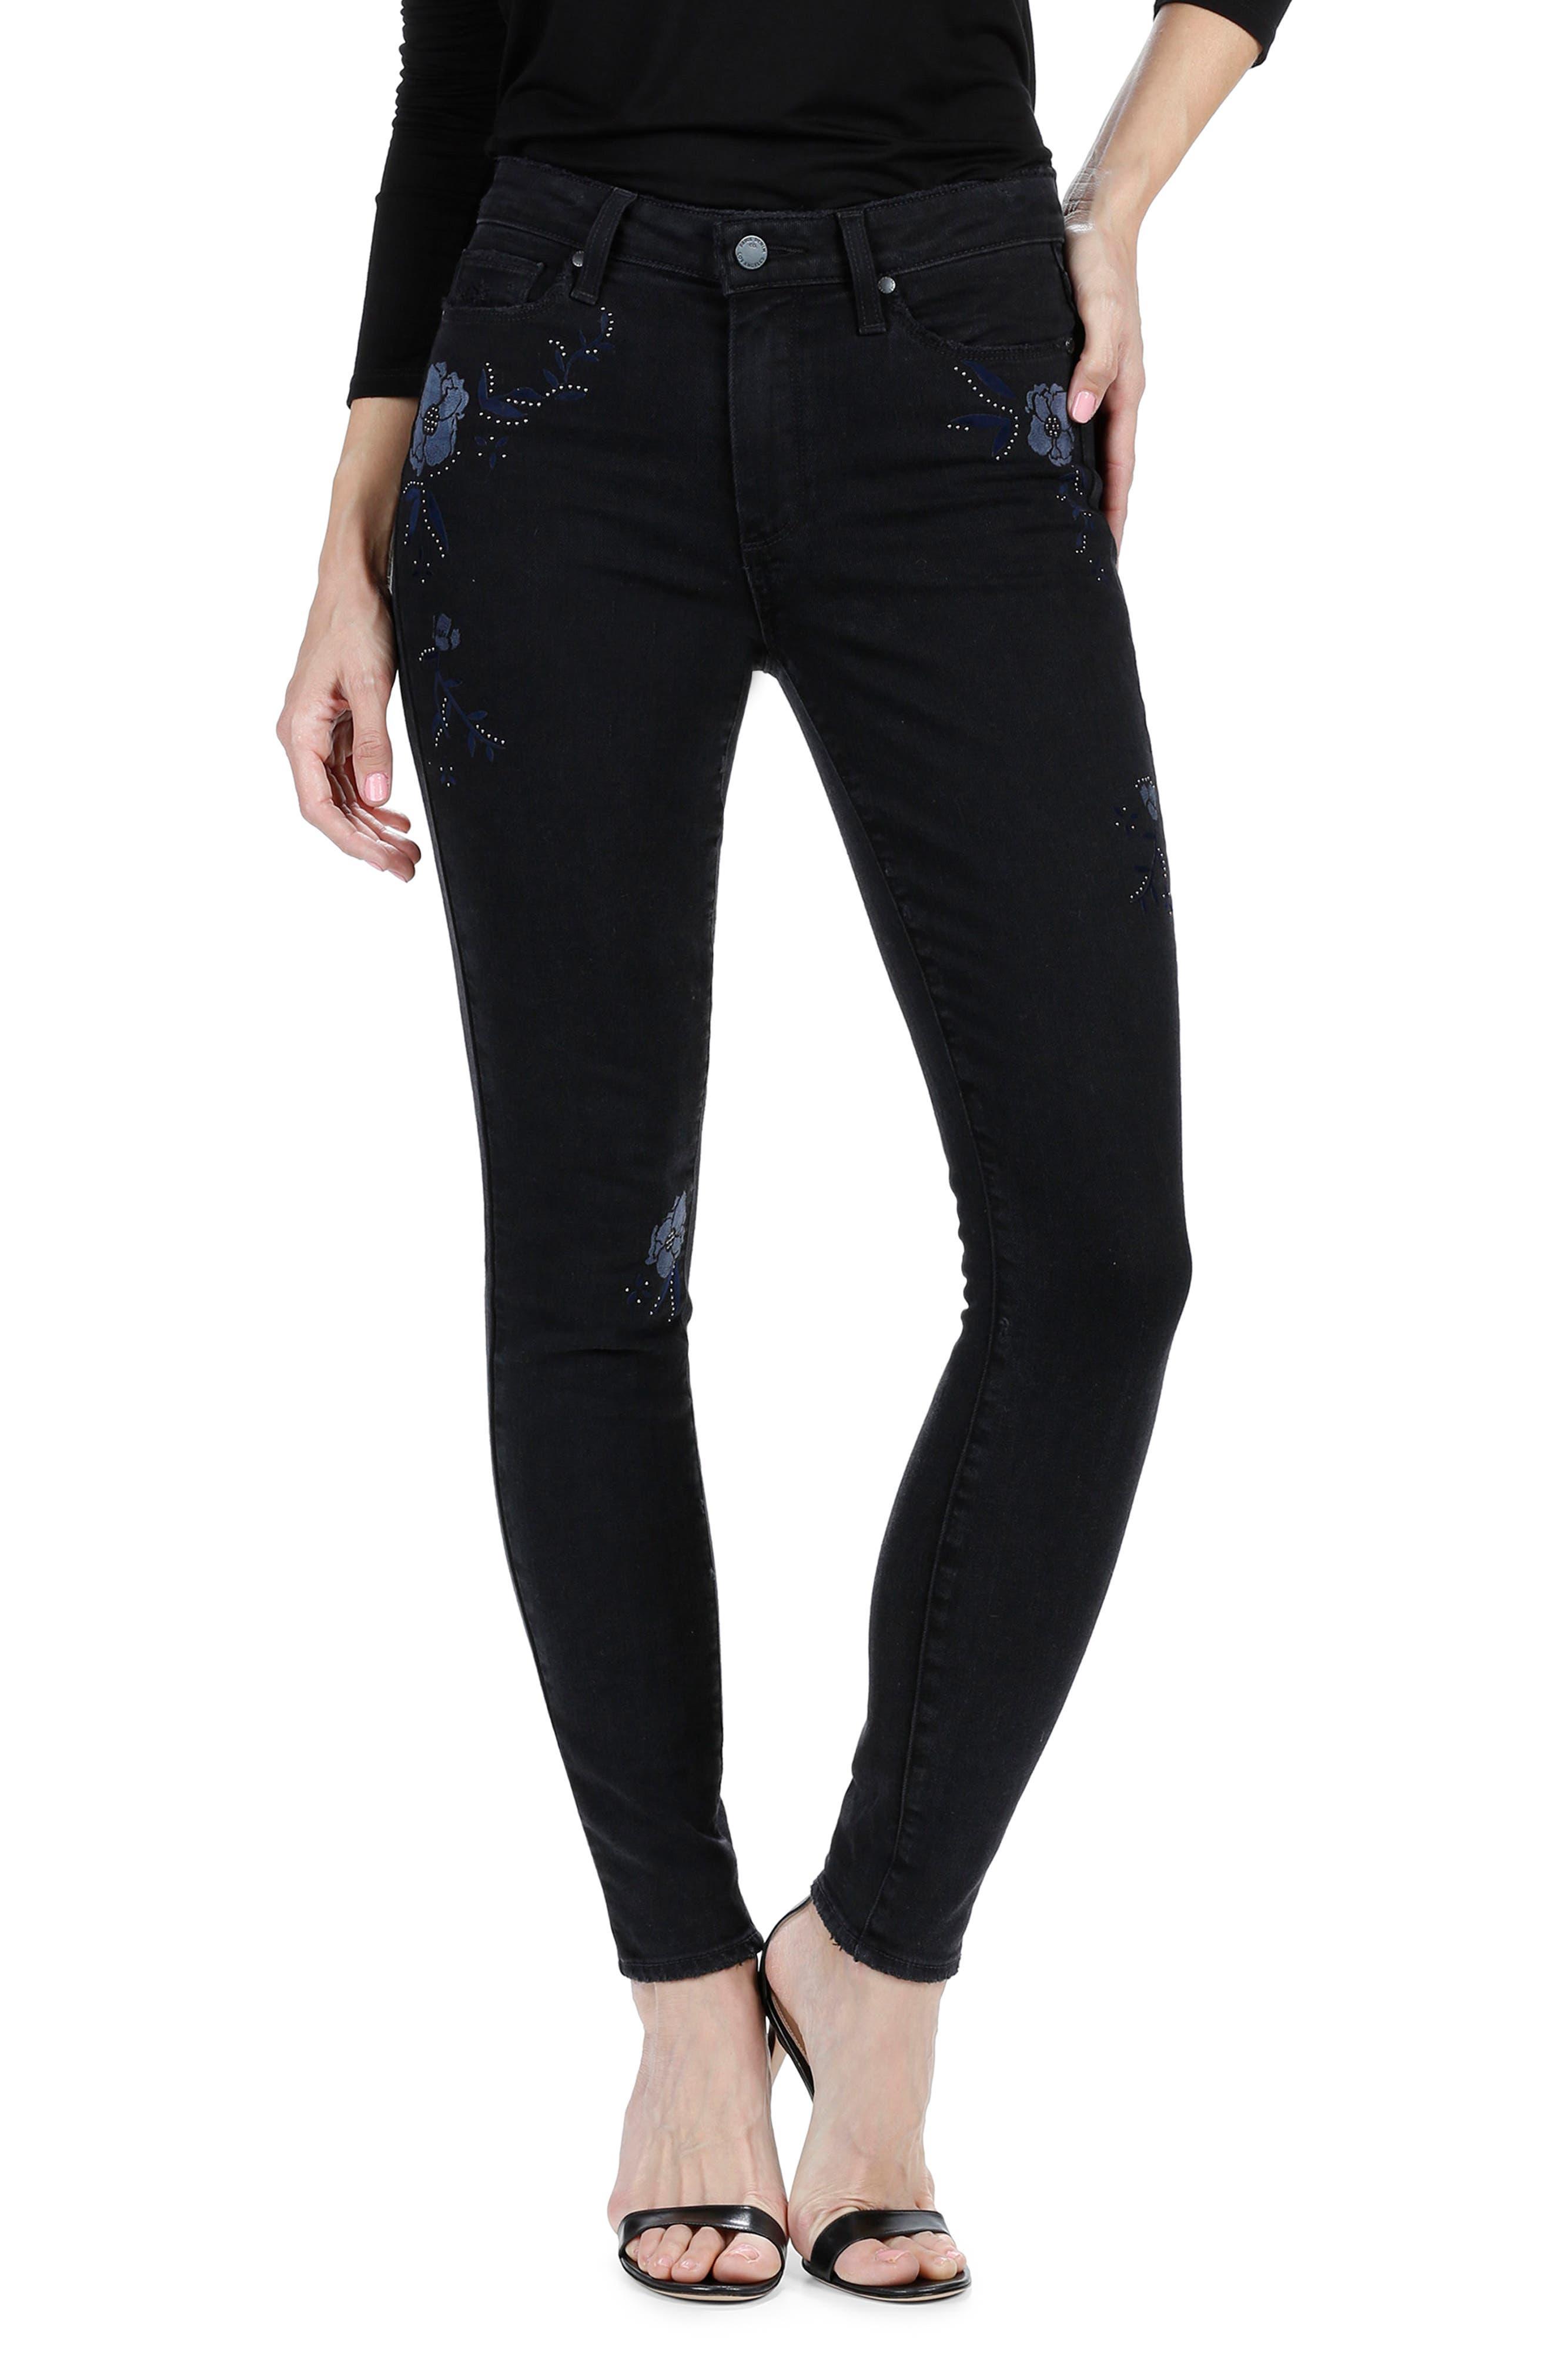 Hoxton High Waist Ultra Skinny Jeans,                         Main,                         color, 001